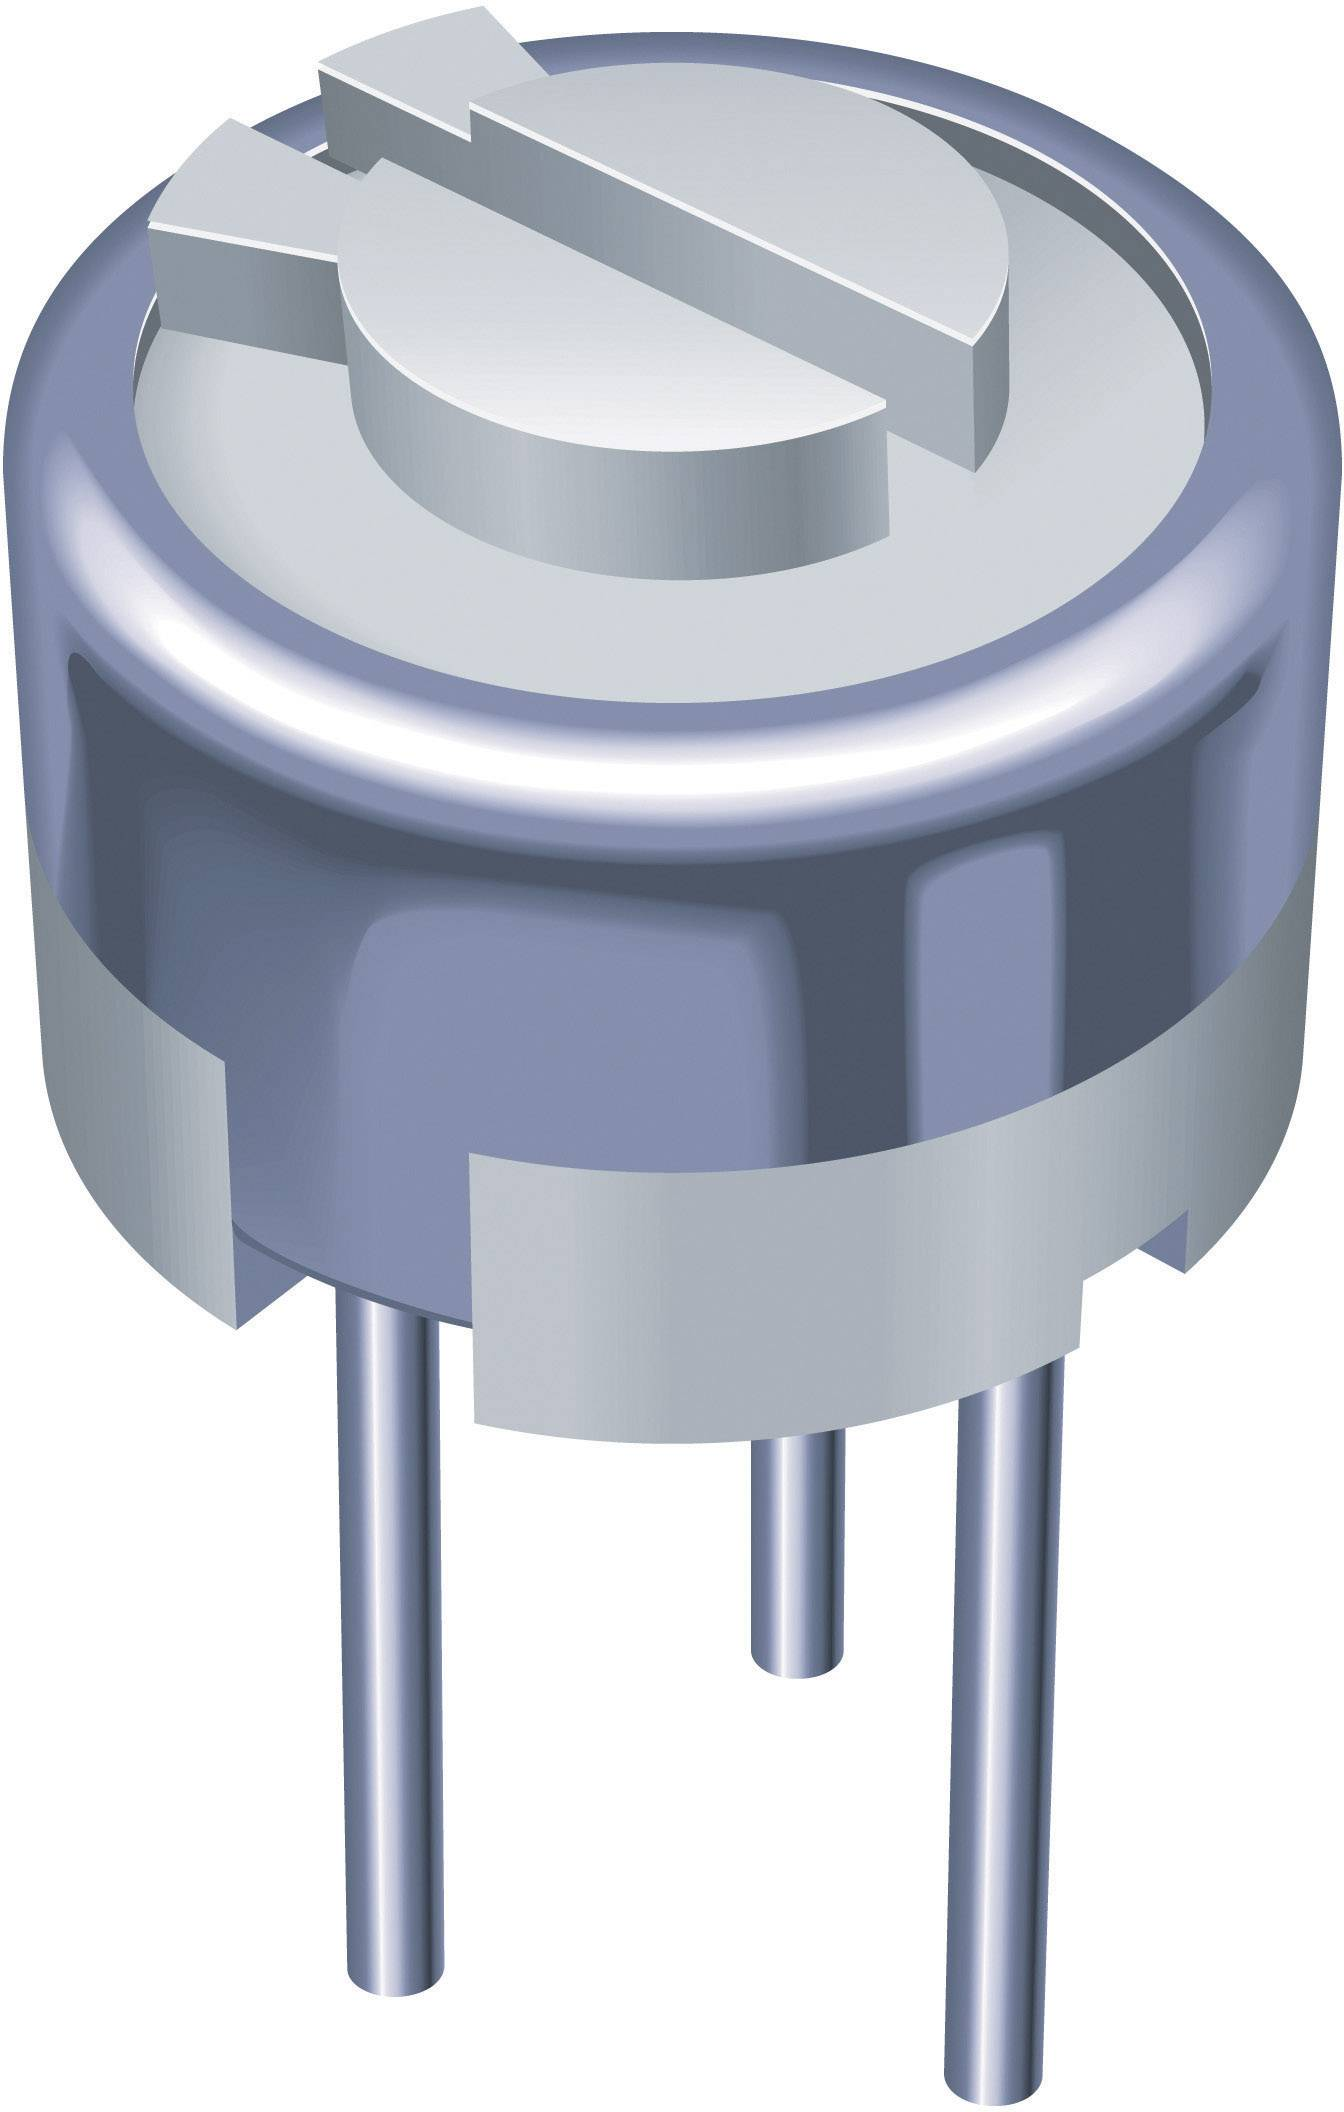 Odporový trimr Bourns, 3329H-1-503LF, 50 kΩ, 0,5 W, ± 10 %